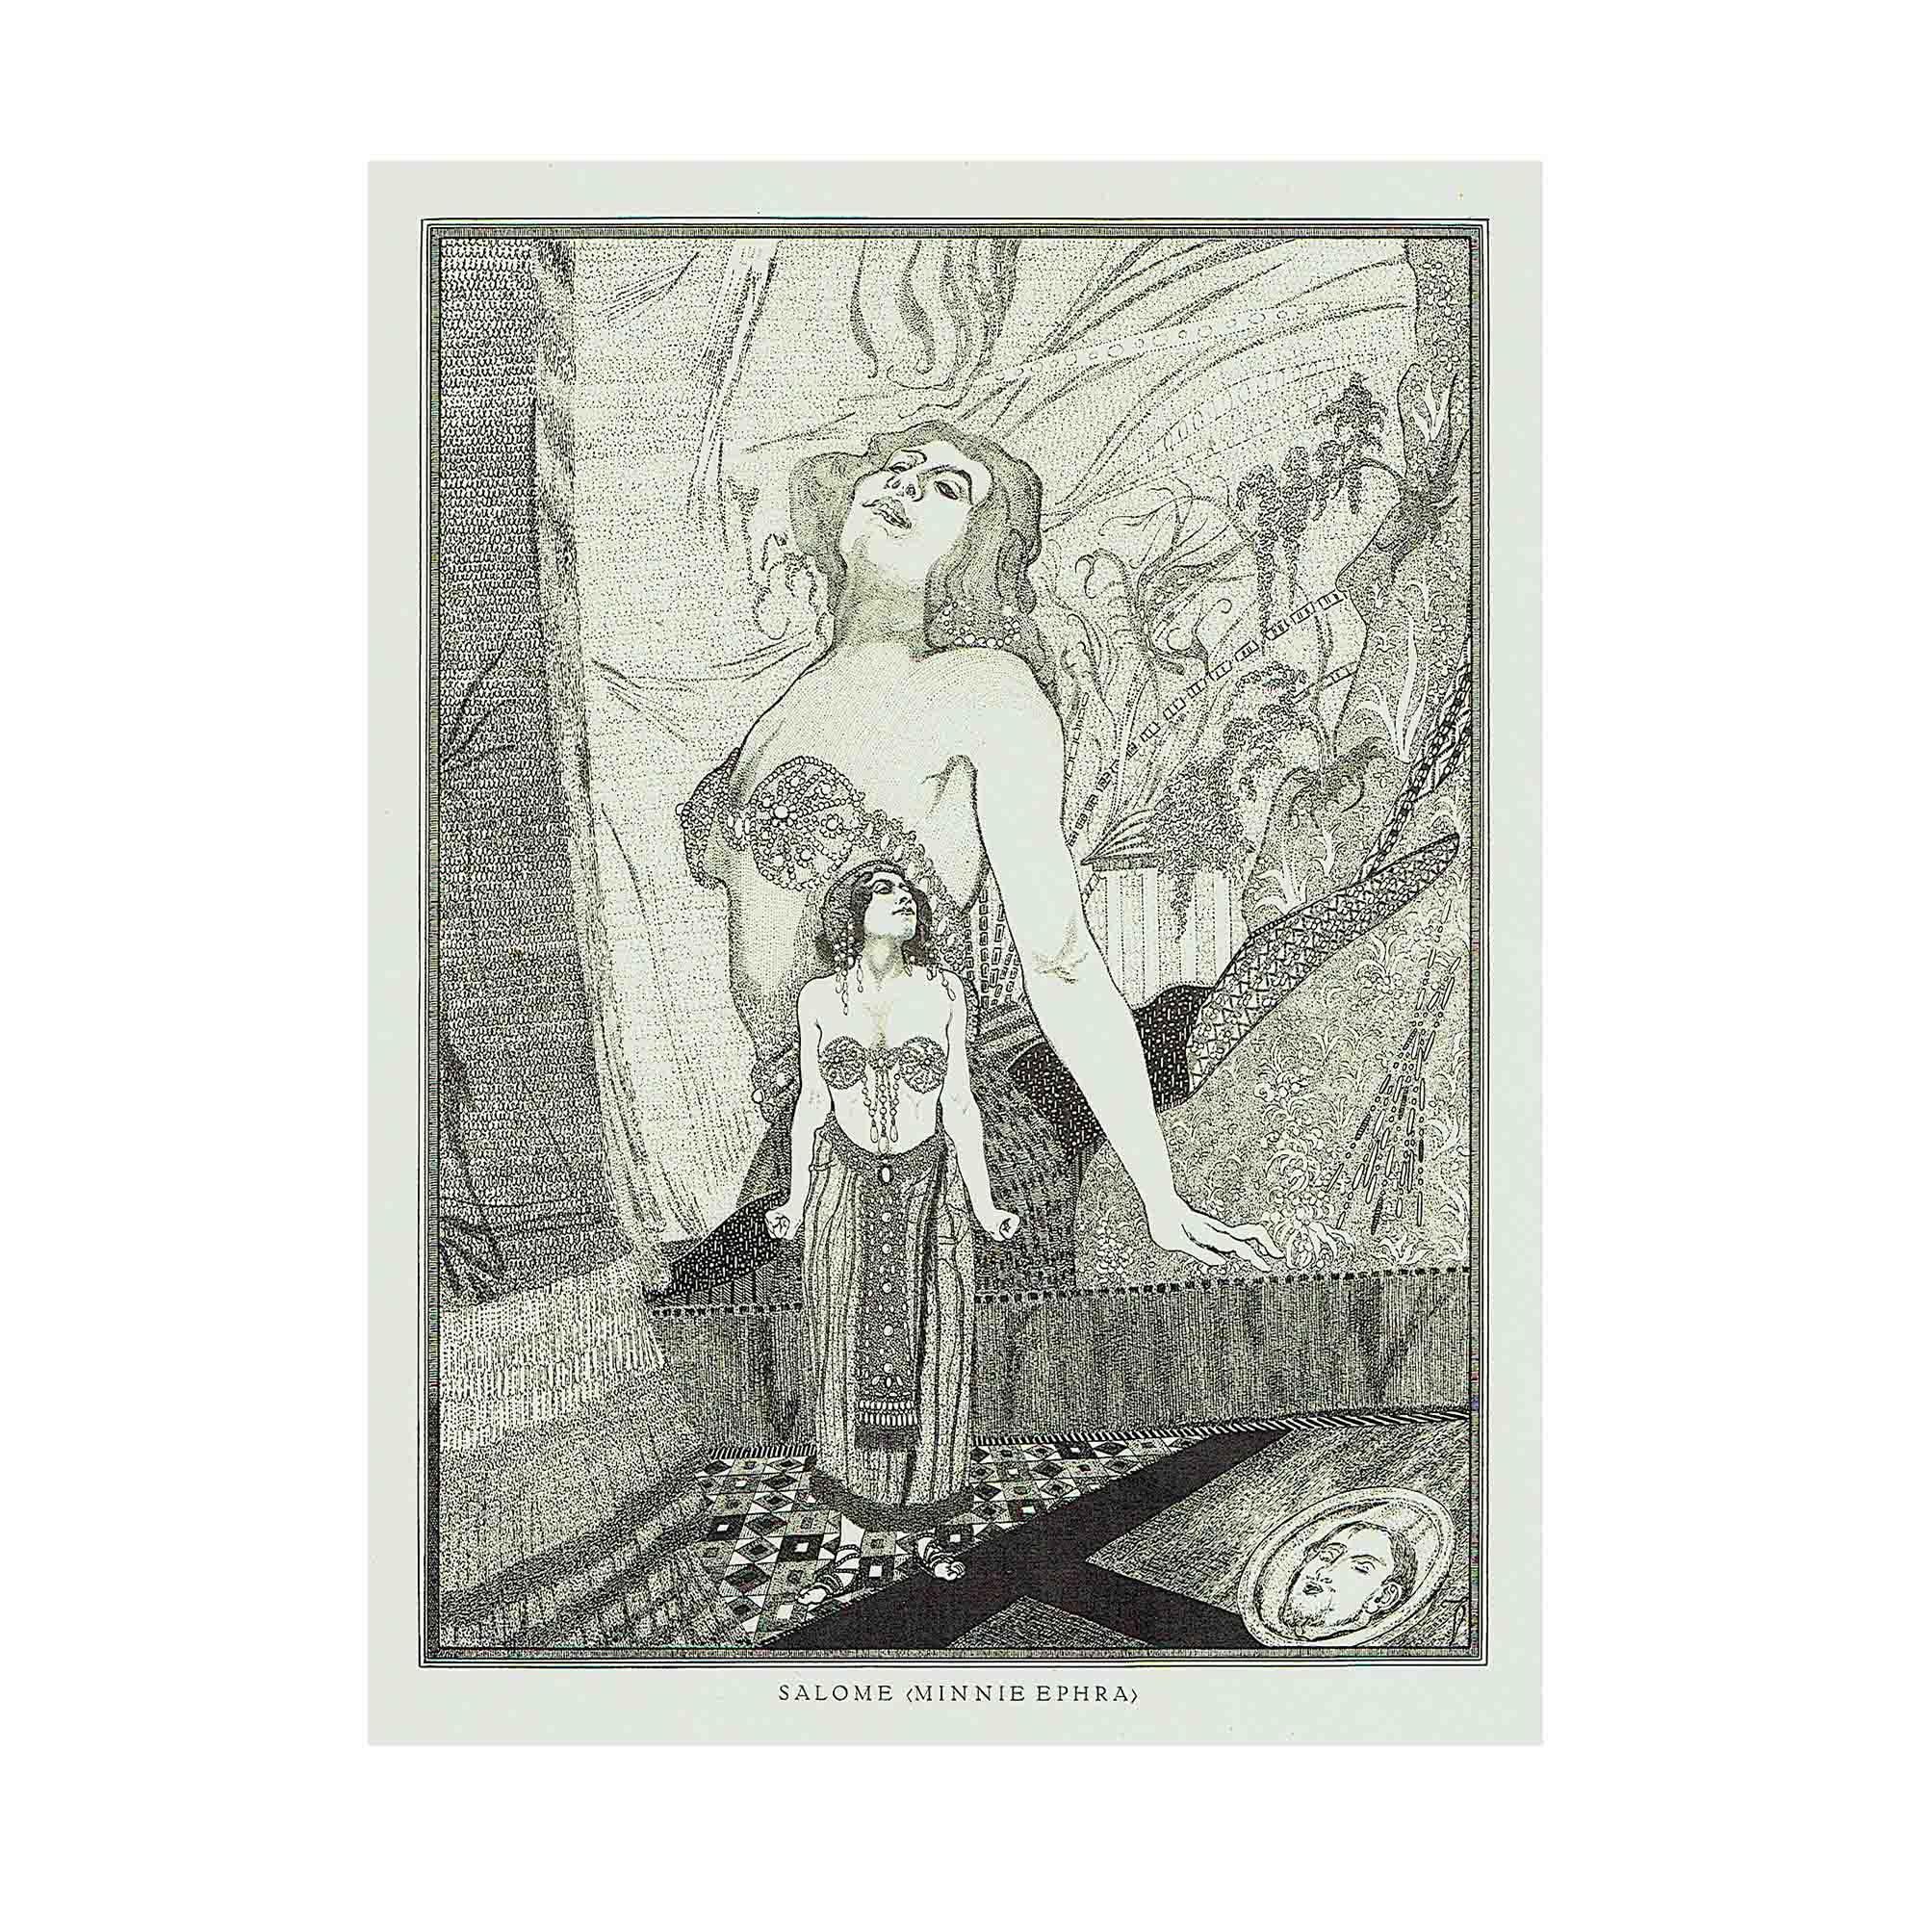 5593-Vrieslander-Rose-Mirliton-Widmung-Stefan-Zweig-1914-Salome-N.jpg